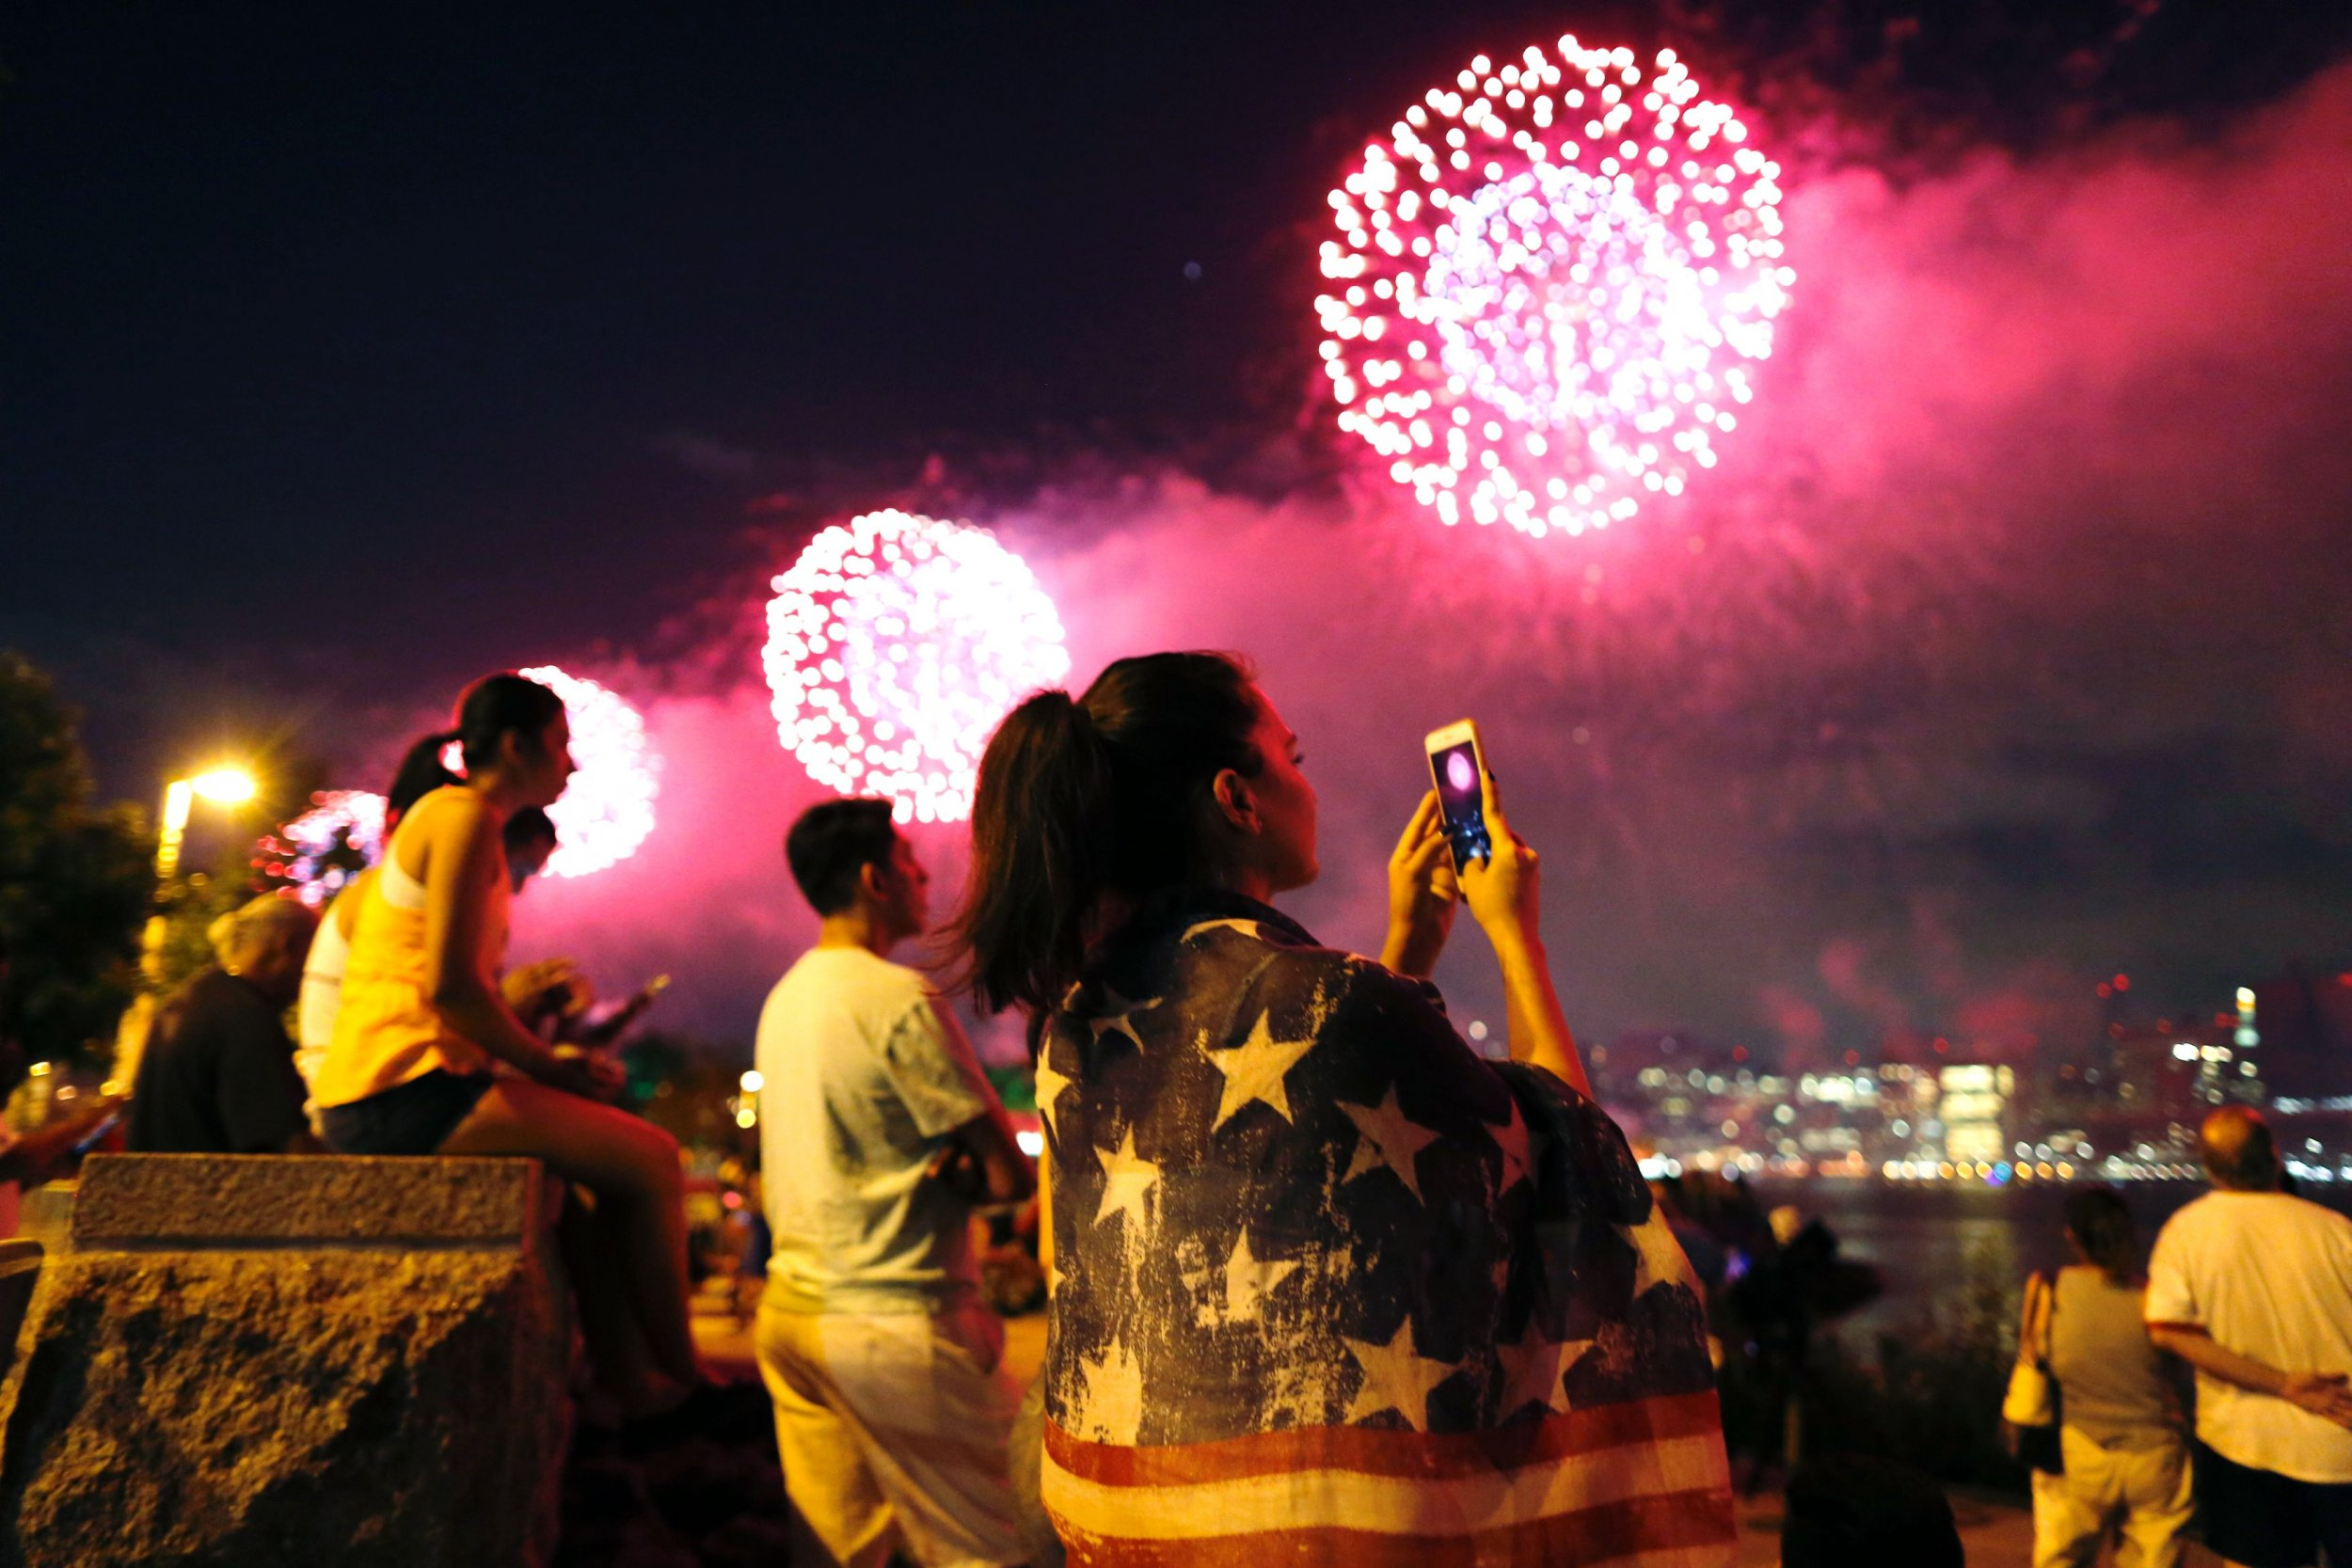 07_04_18_FireworksStart